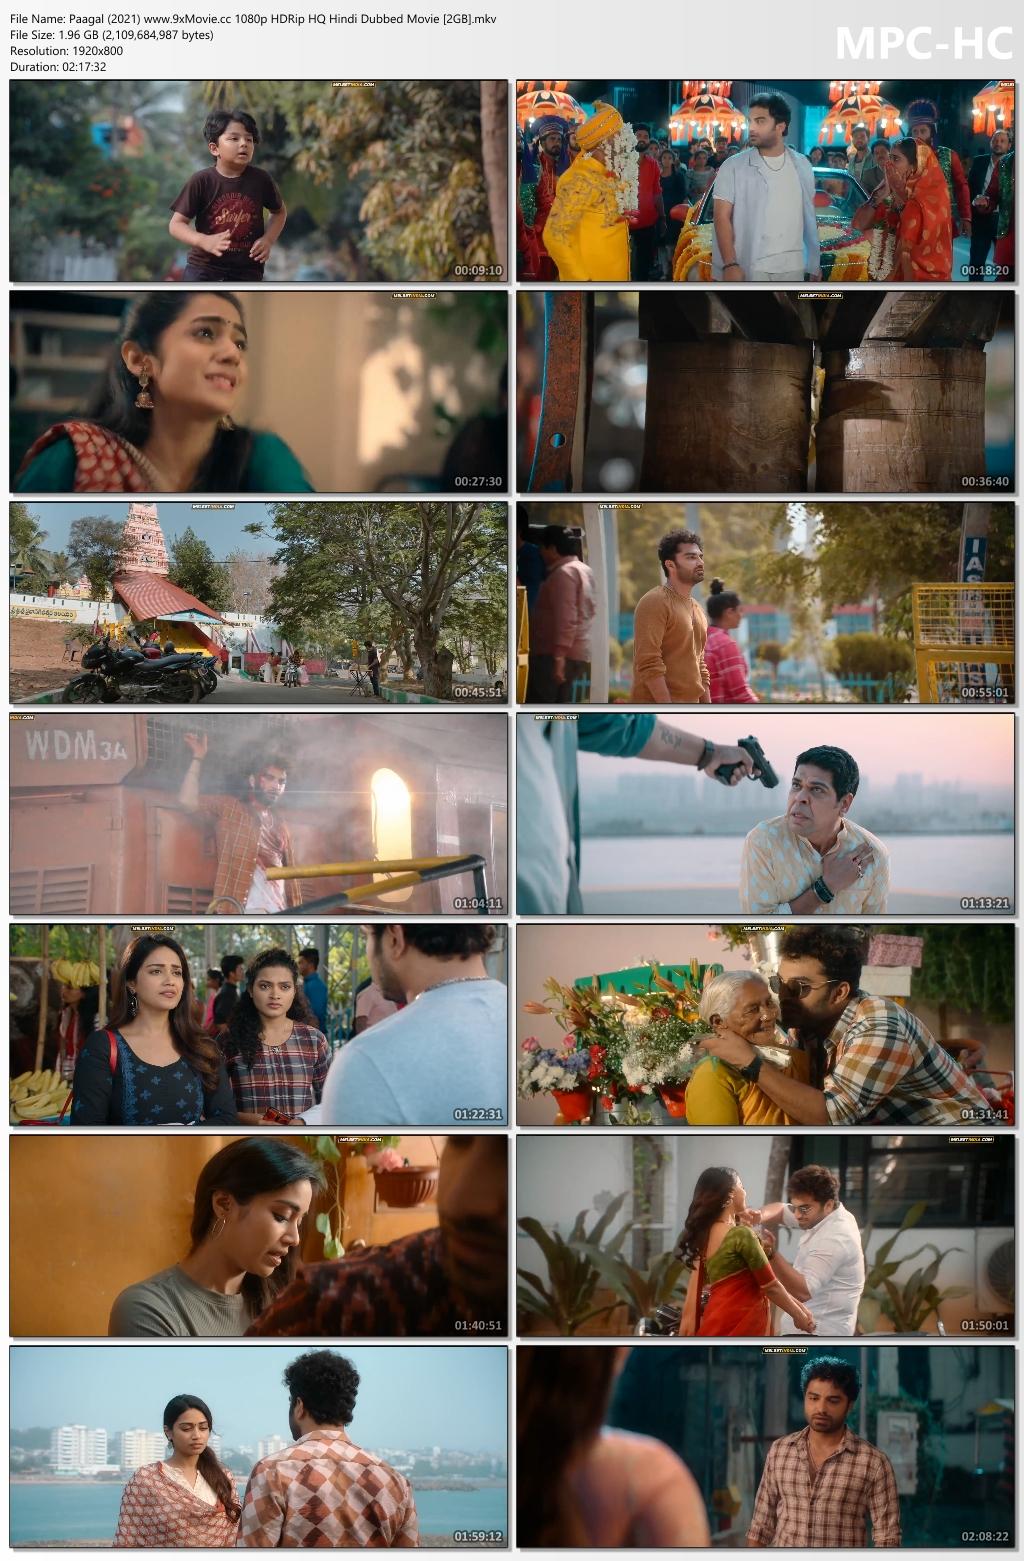 Paagal-2021-www-9x-Movie-cc-1080p-HDRip-HQ-Hindi-Dubbed-Movie-2-GB-mkv